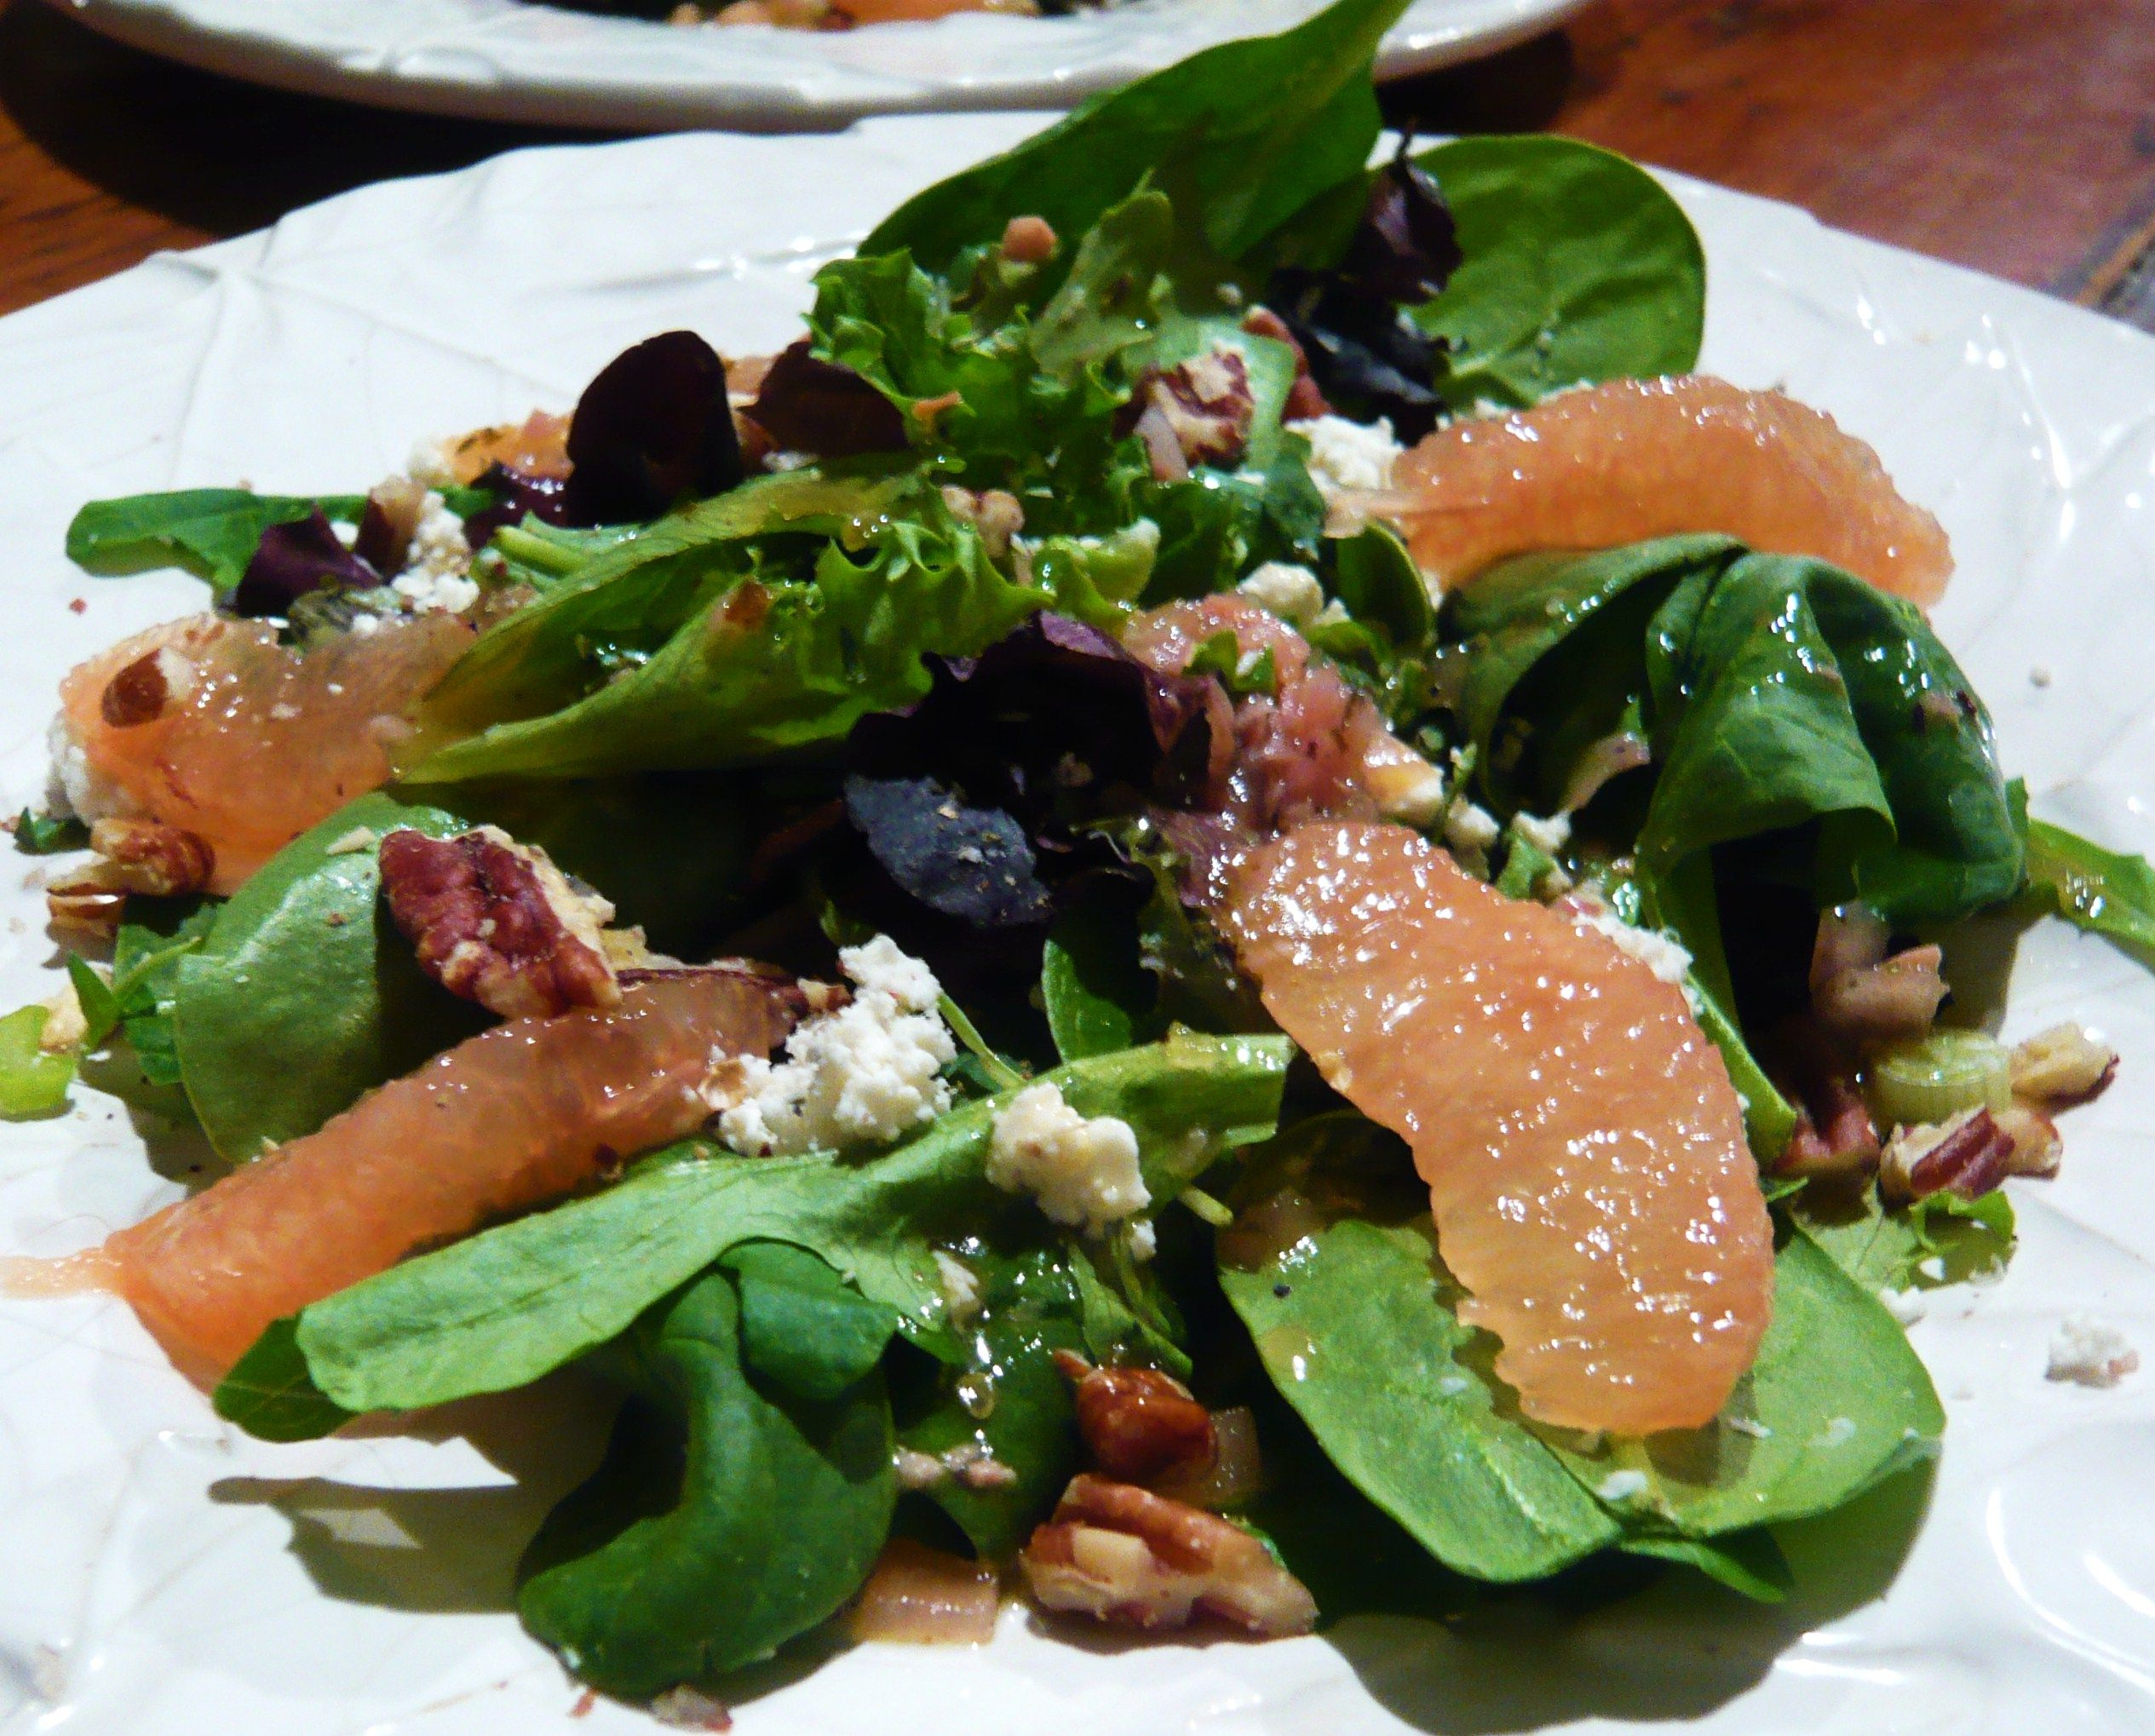 Decadent Winter Salad